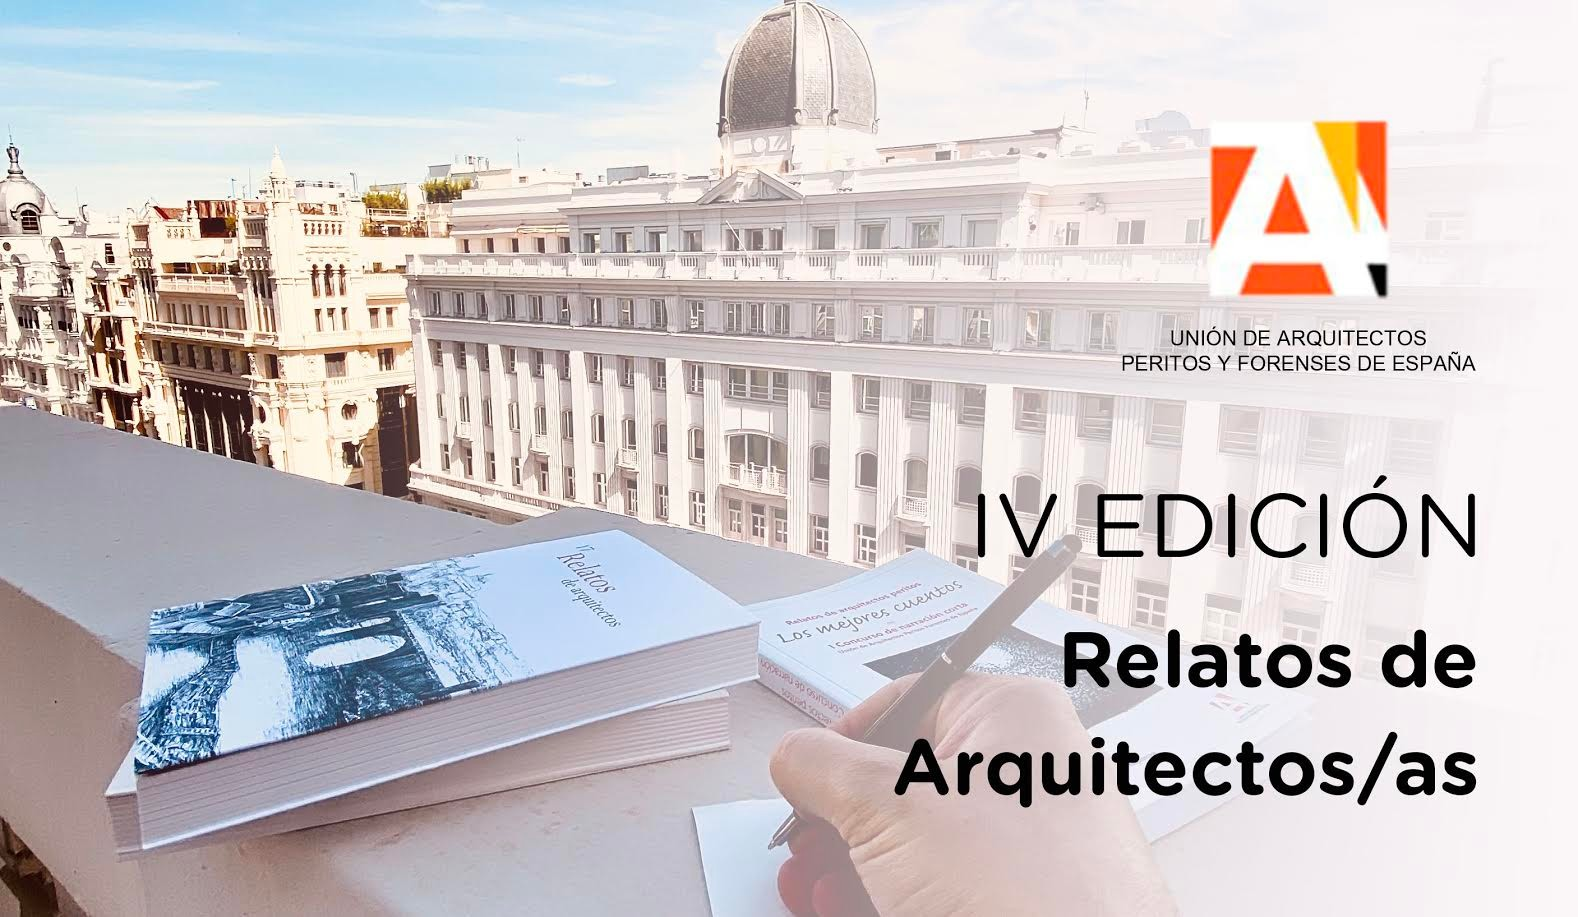 Últimos días   IV Edición del Concurso de narración corta «Relatos de Arquitectos»